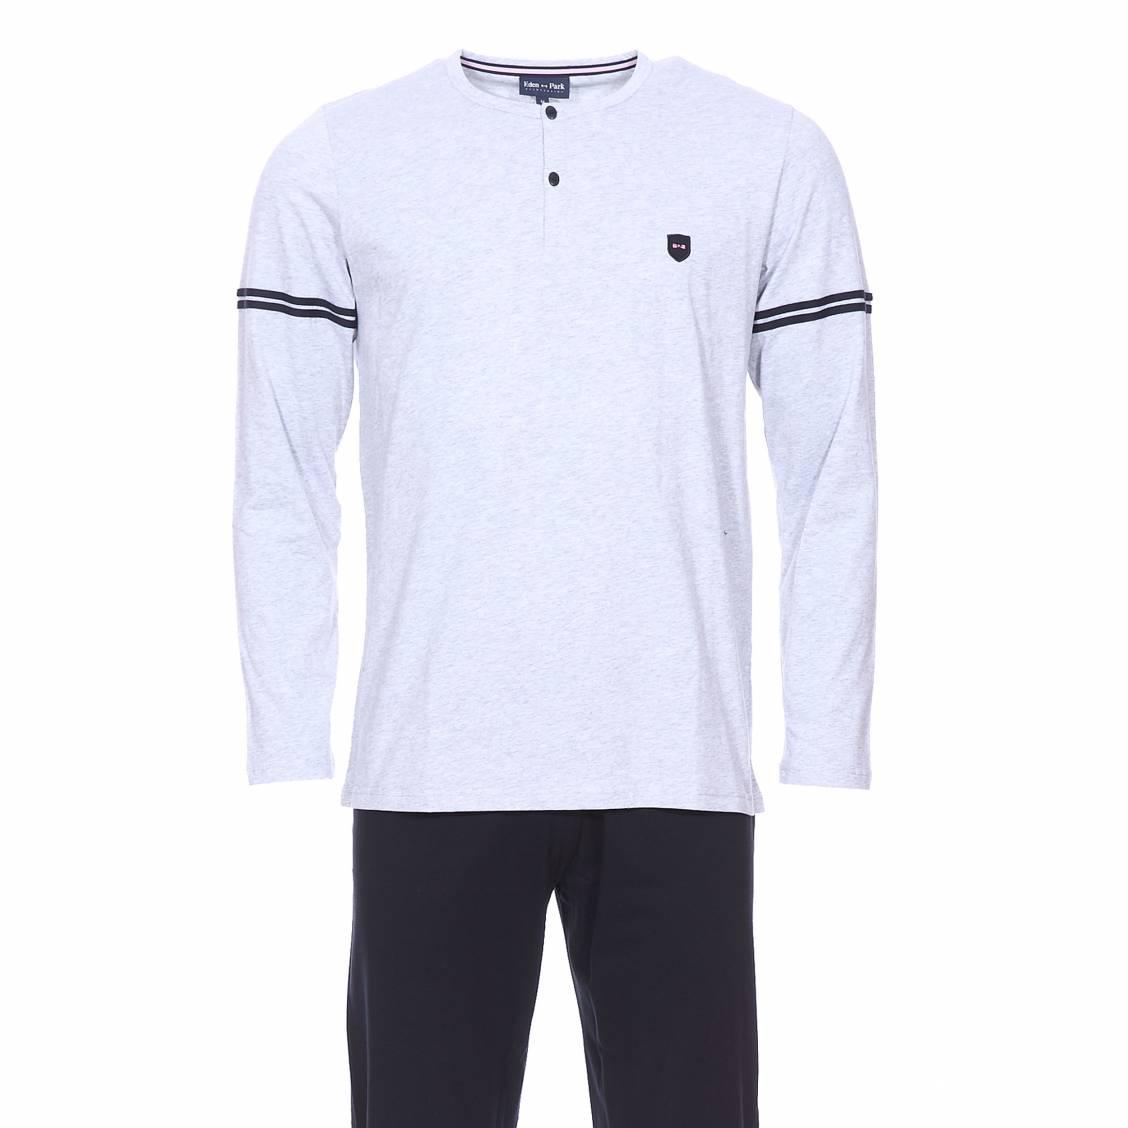 Pyjama long  en coton : tee-shirt col tunisien gris chiné et pantalon bleu marine